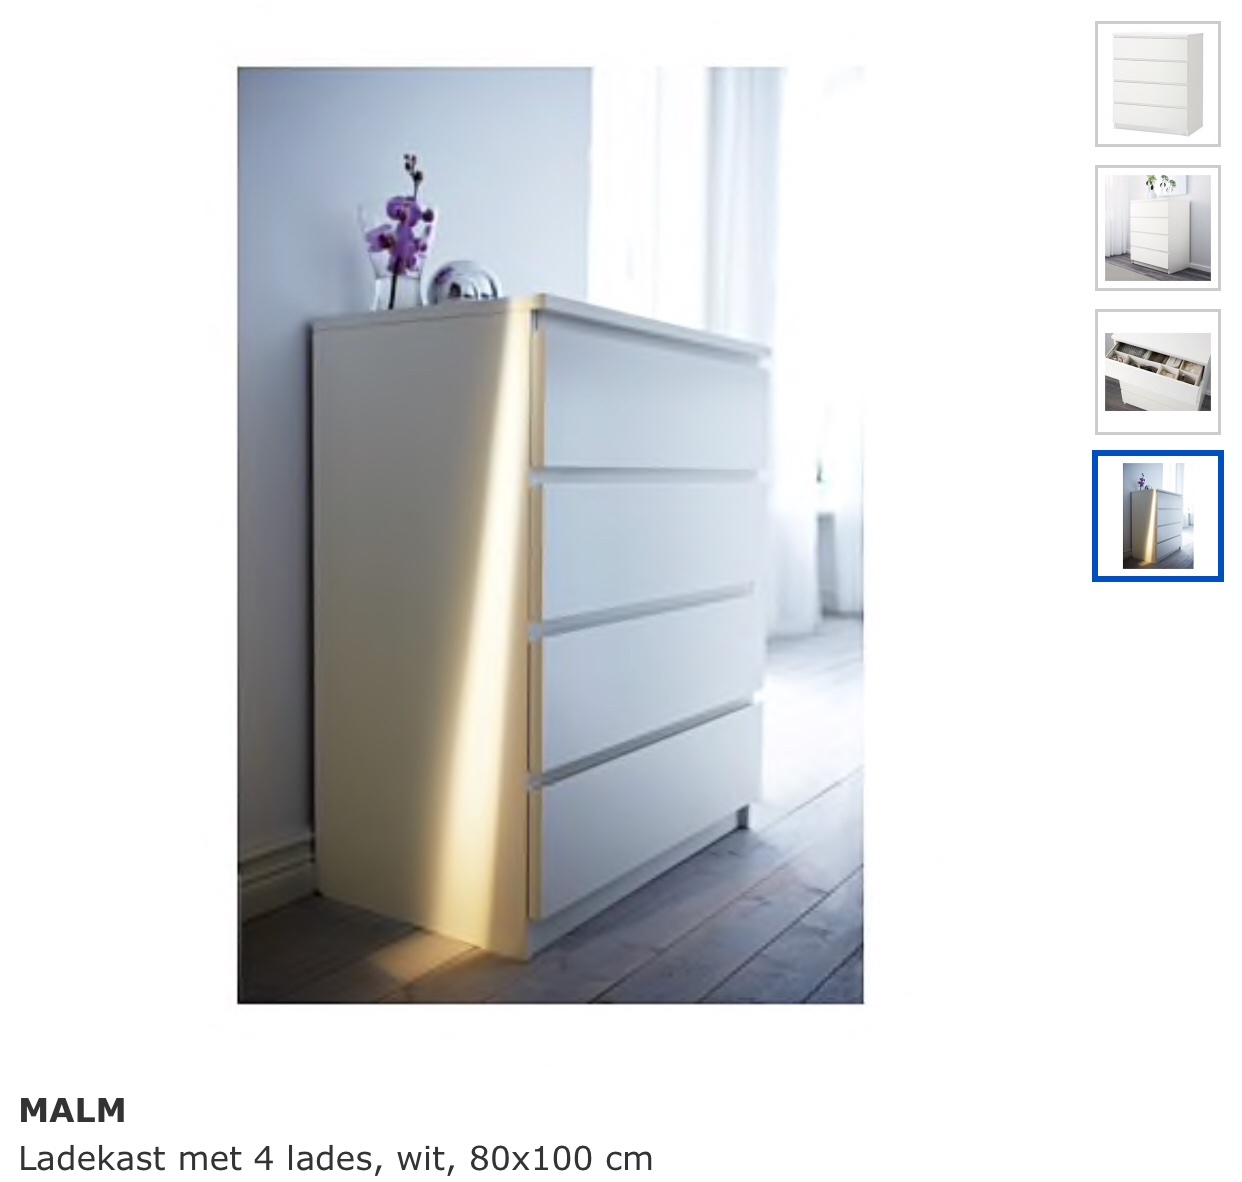 Malm Ladekast Van Ikea.8 Ladekasten Monteren Ikea Malm 4 Lades 80x100cm Werkspot